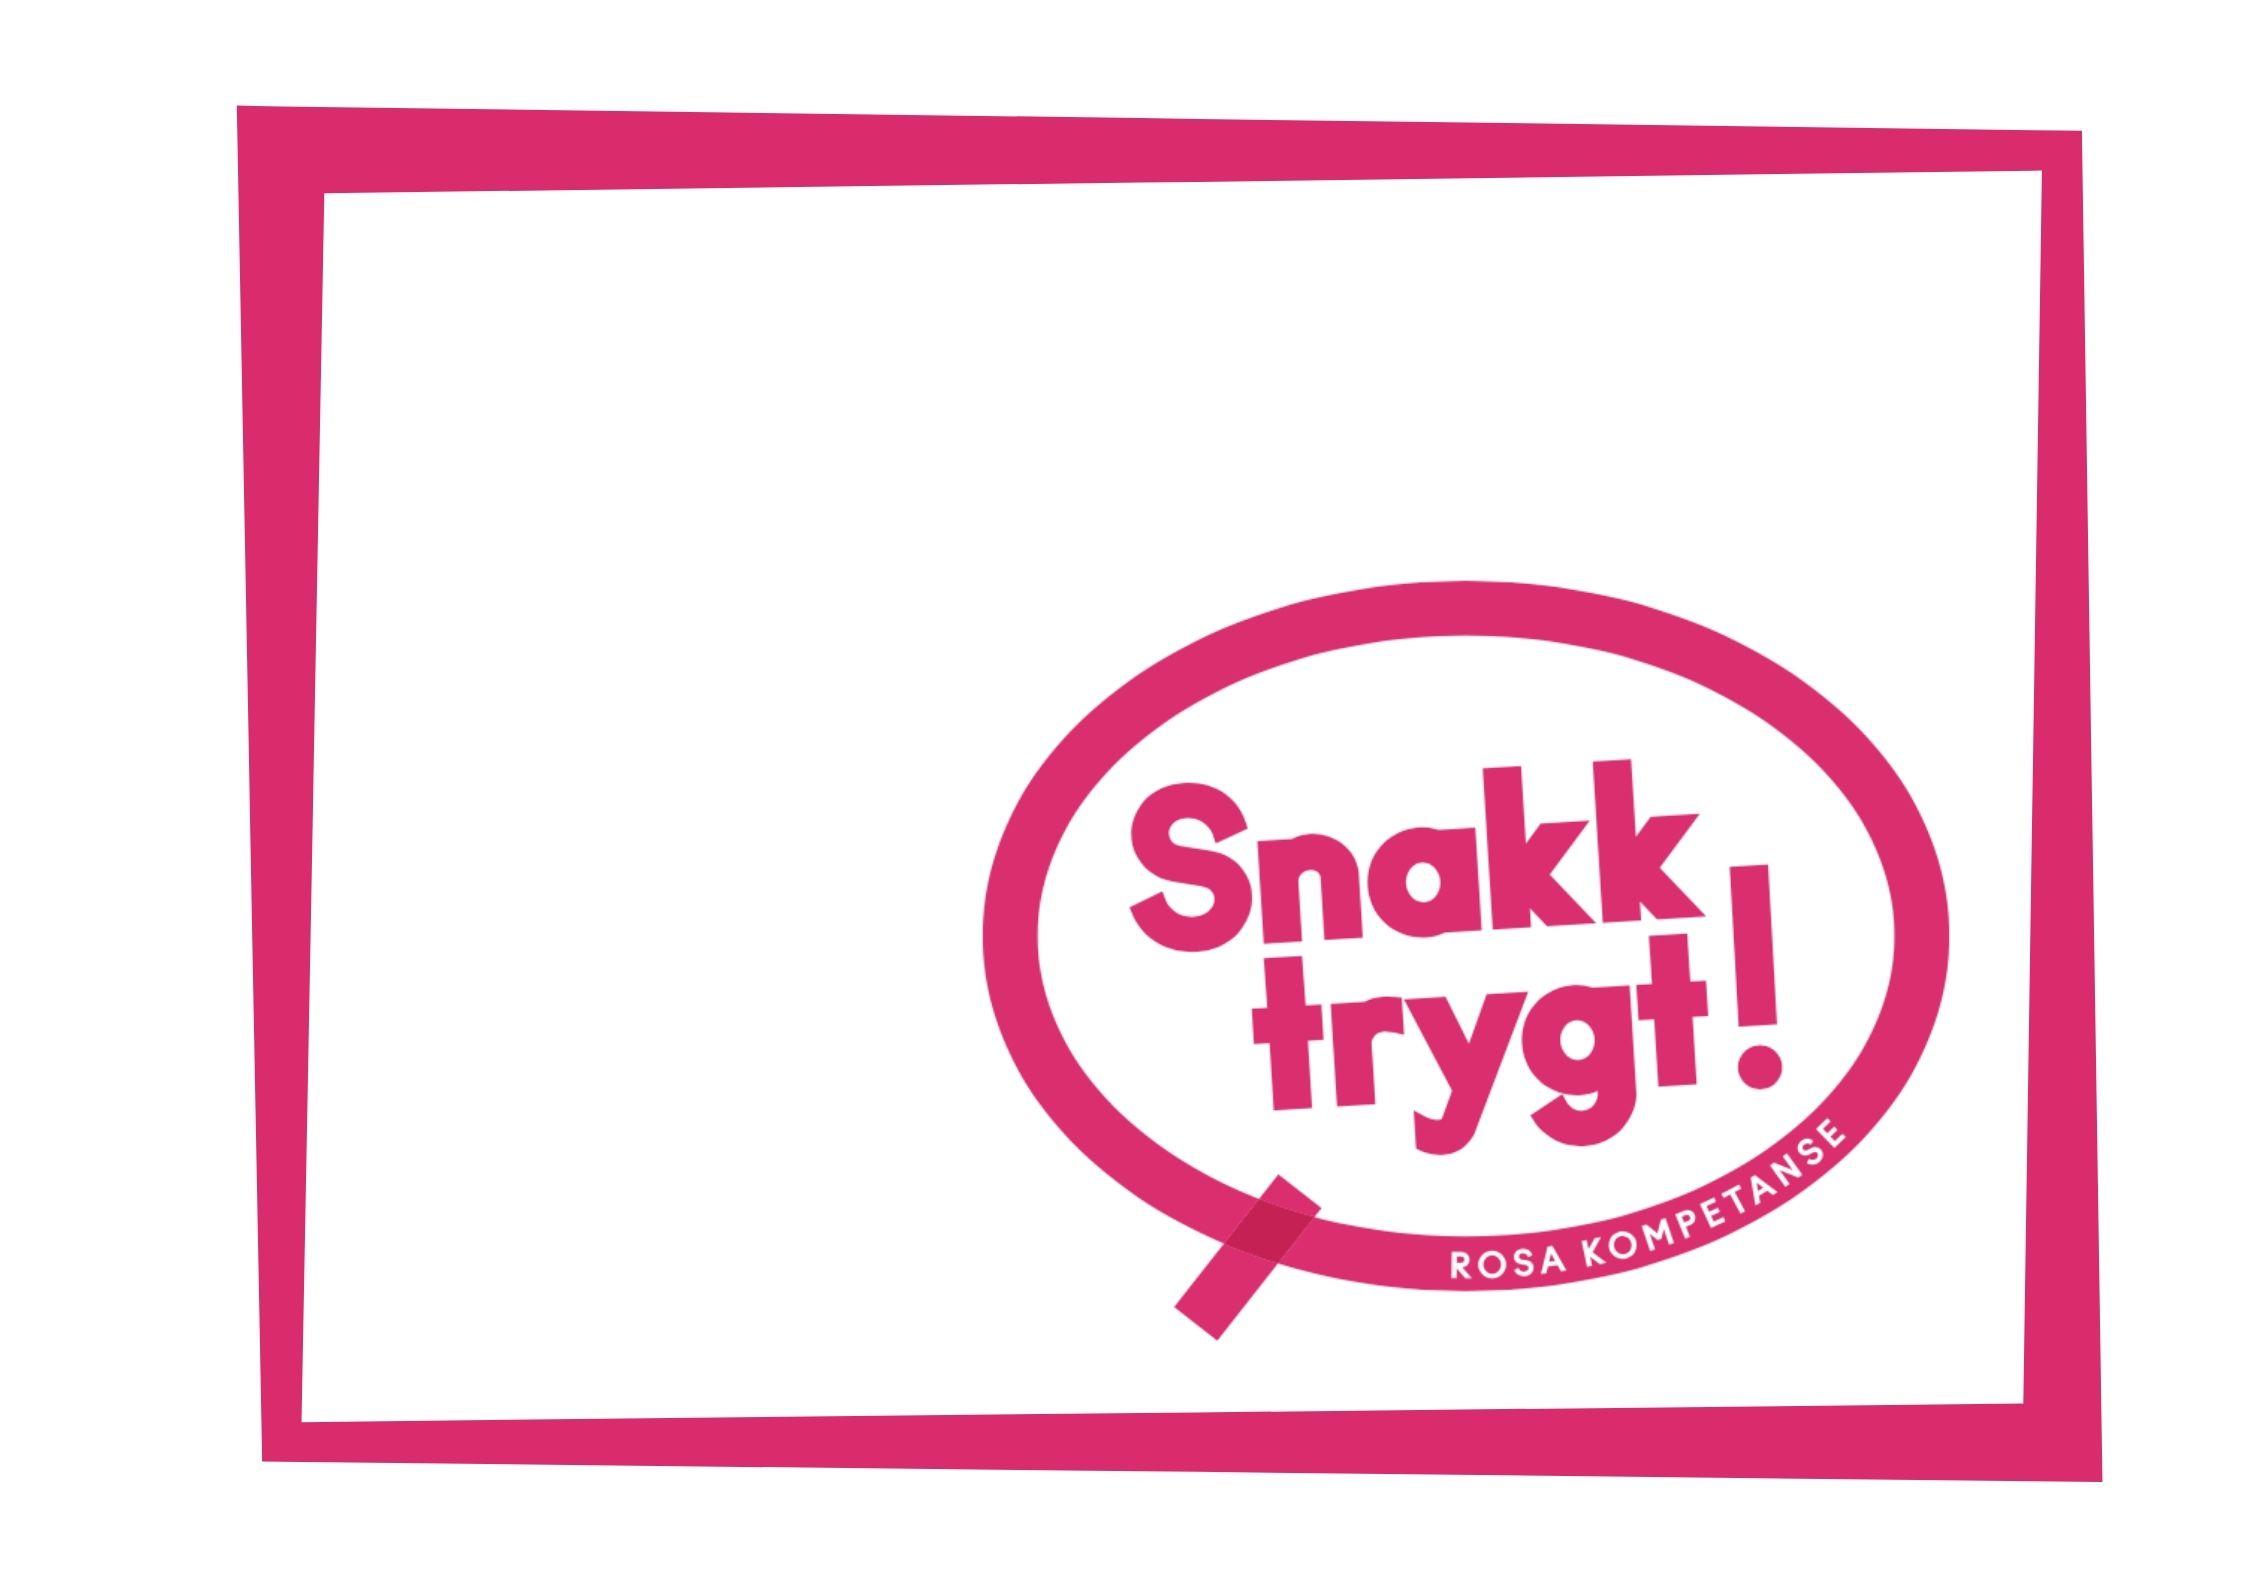 rosa kompetanse-logoen